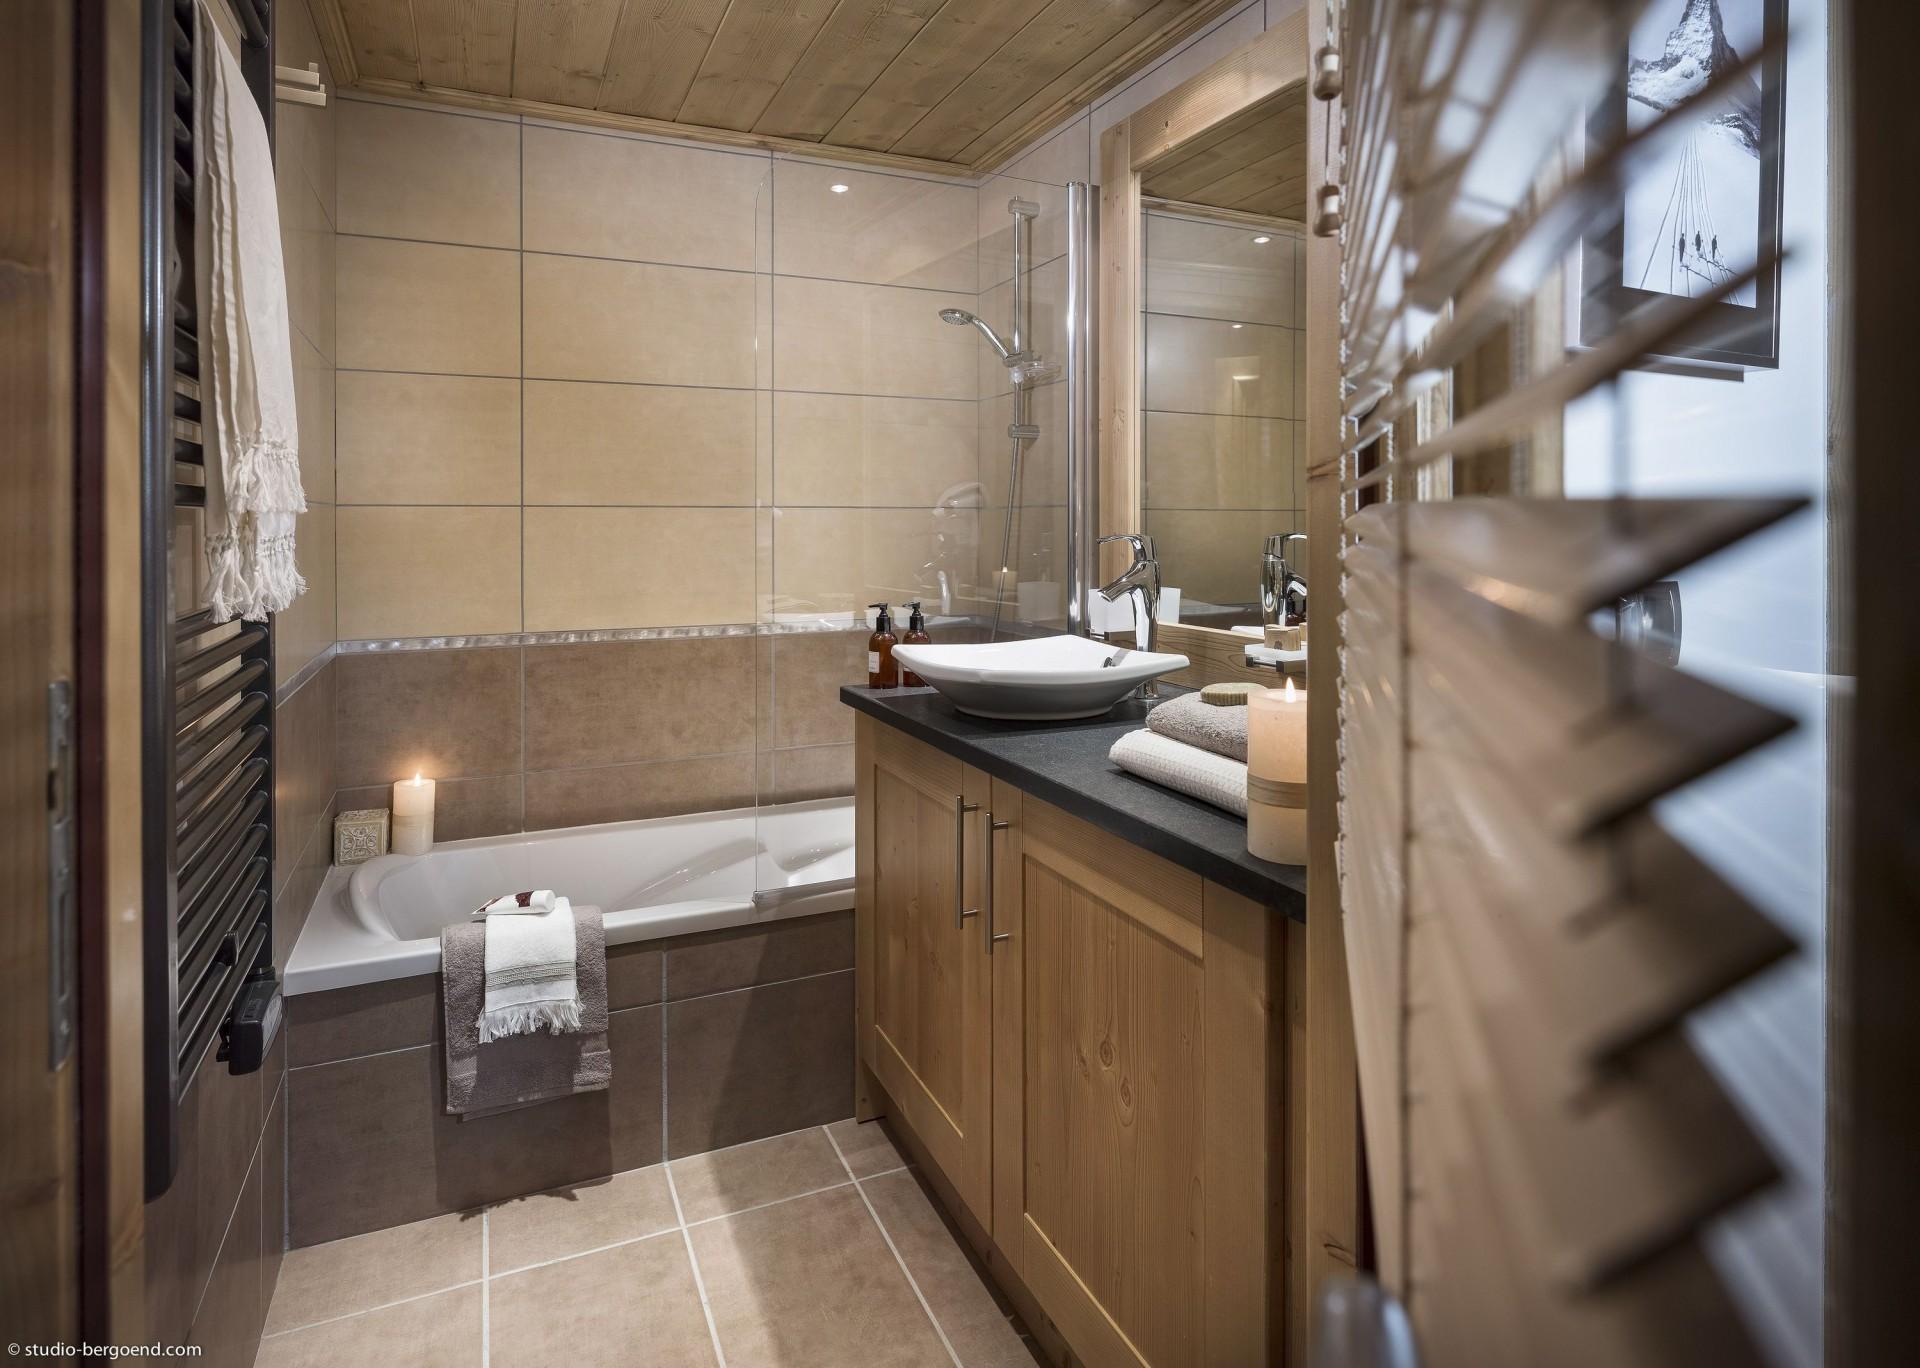 Tignes Location Appartement Luxe Micata Salle De Bain